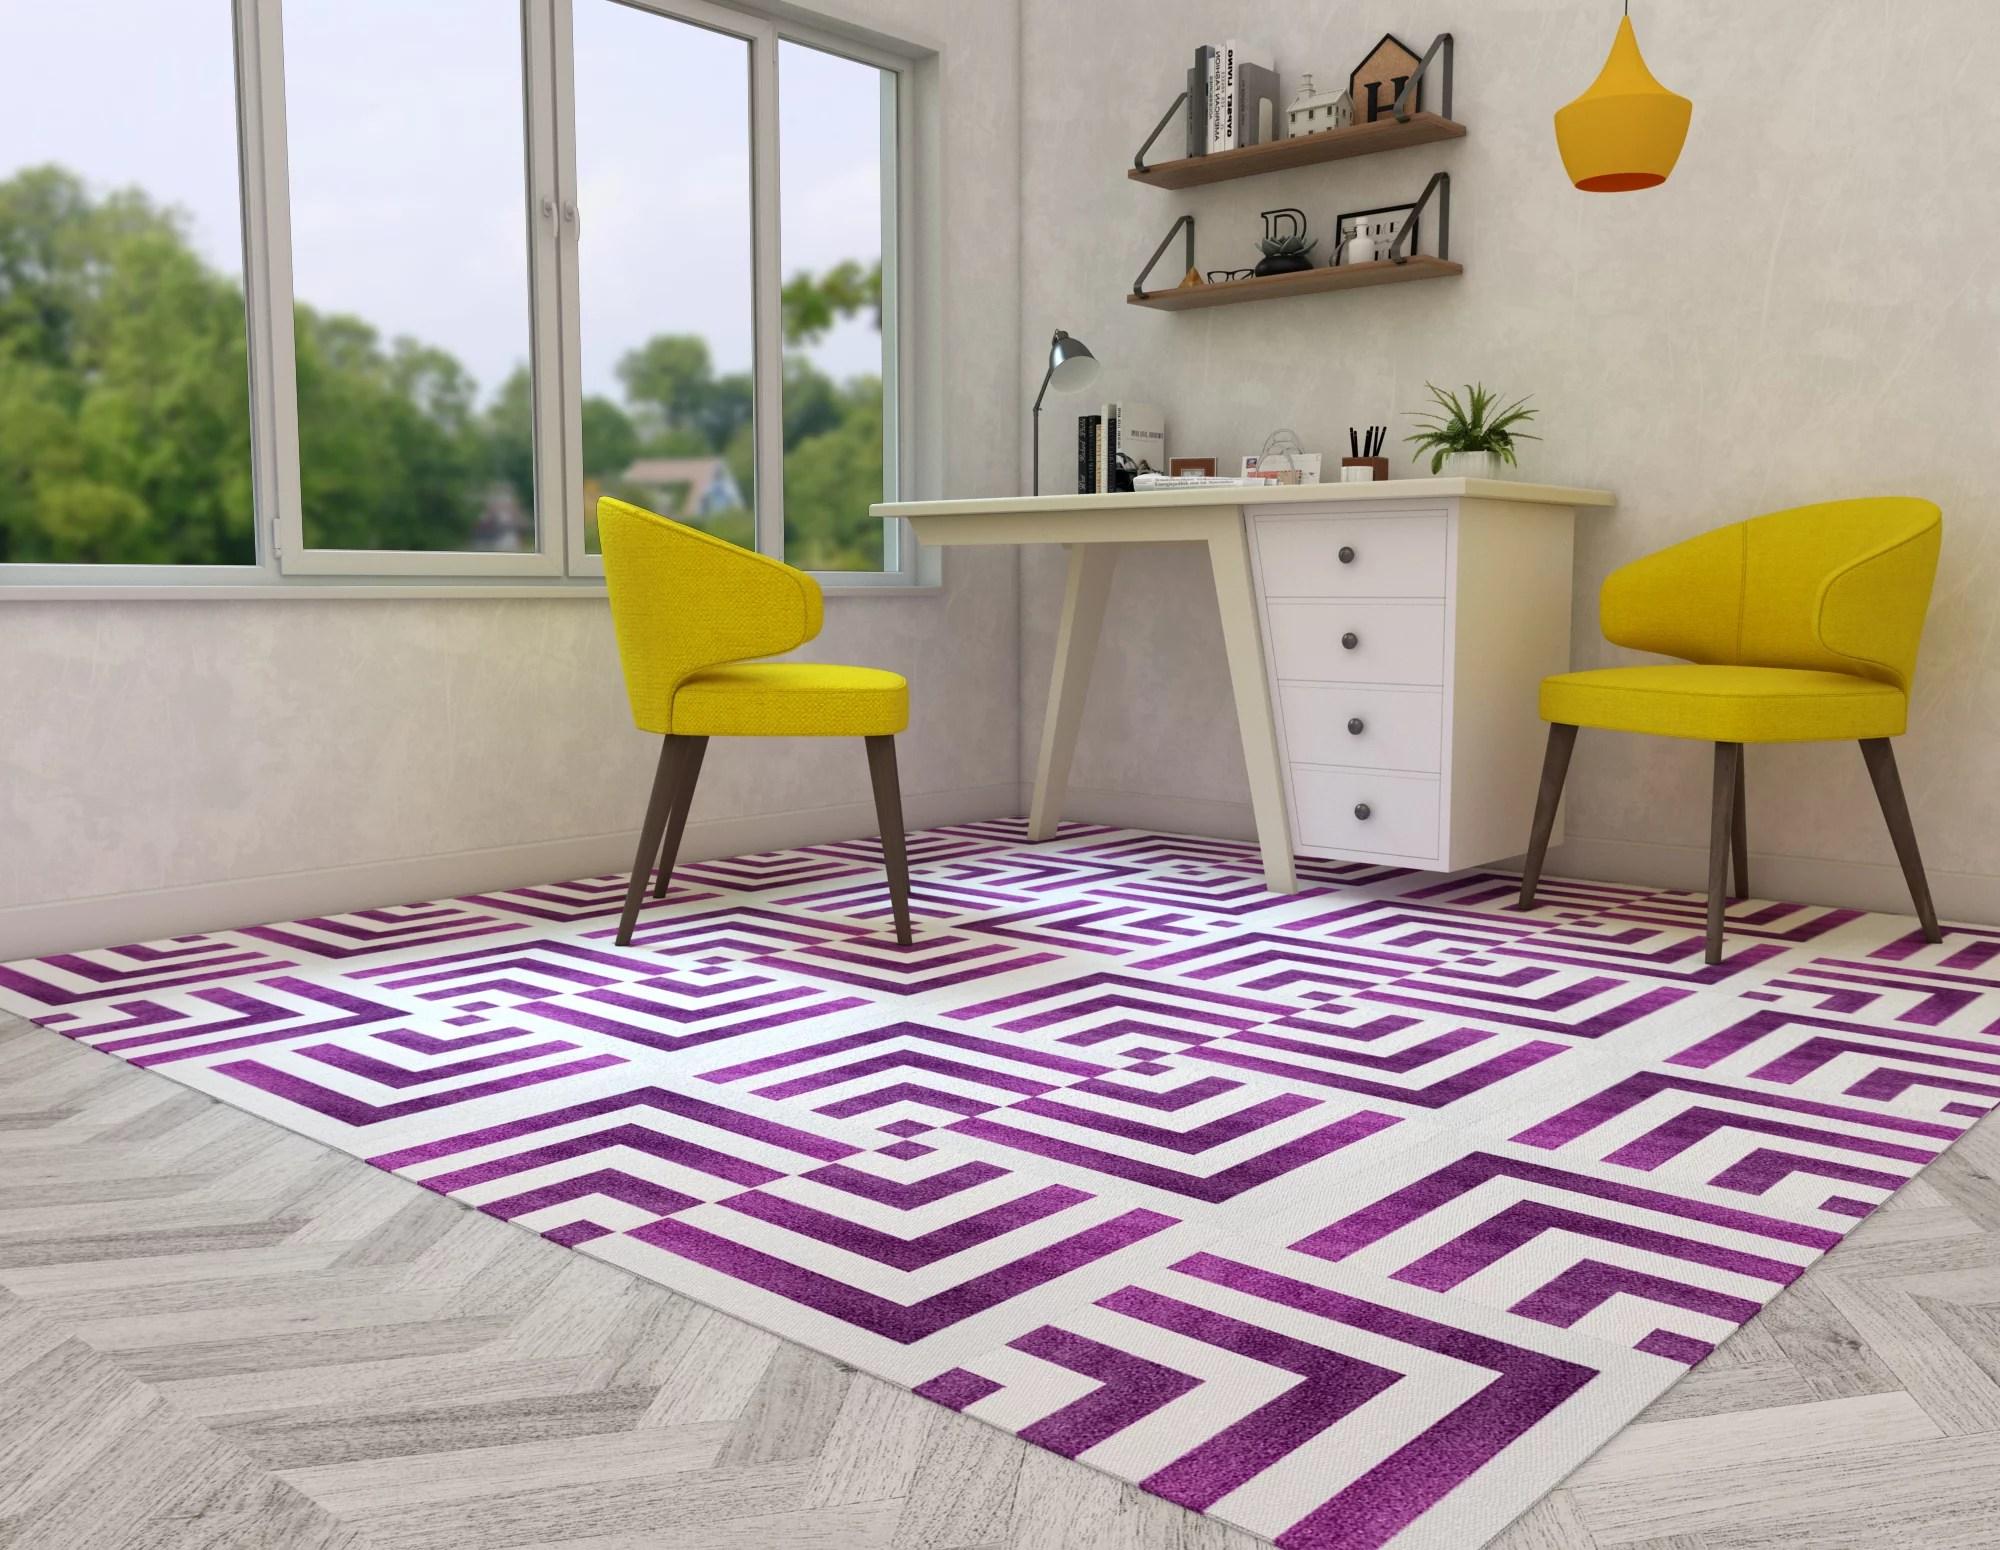 artyzio modular modern geometric carpet squares peel and stick rug tiles 20 piece set 5 x 8 feet pink and white walmart com